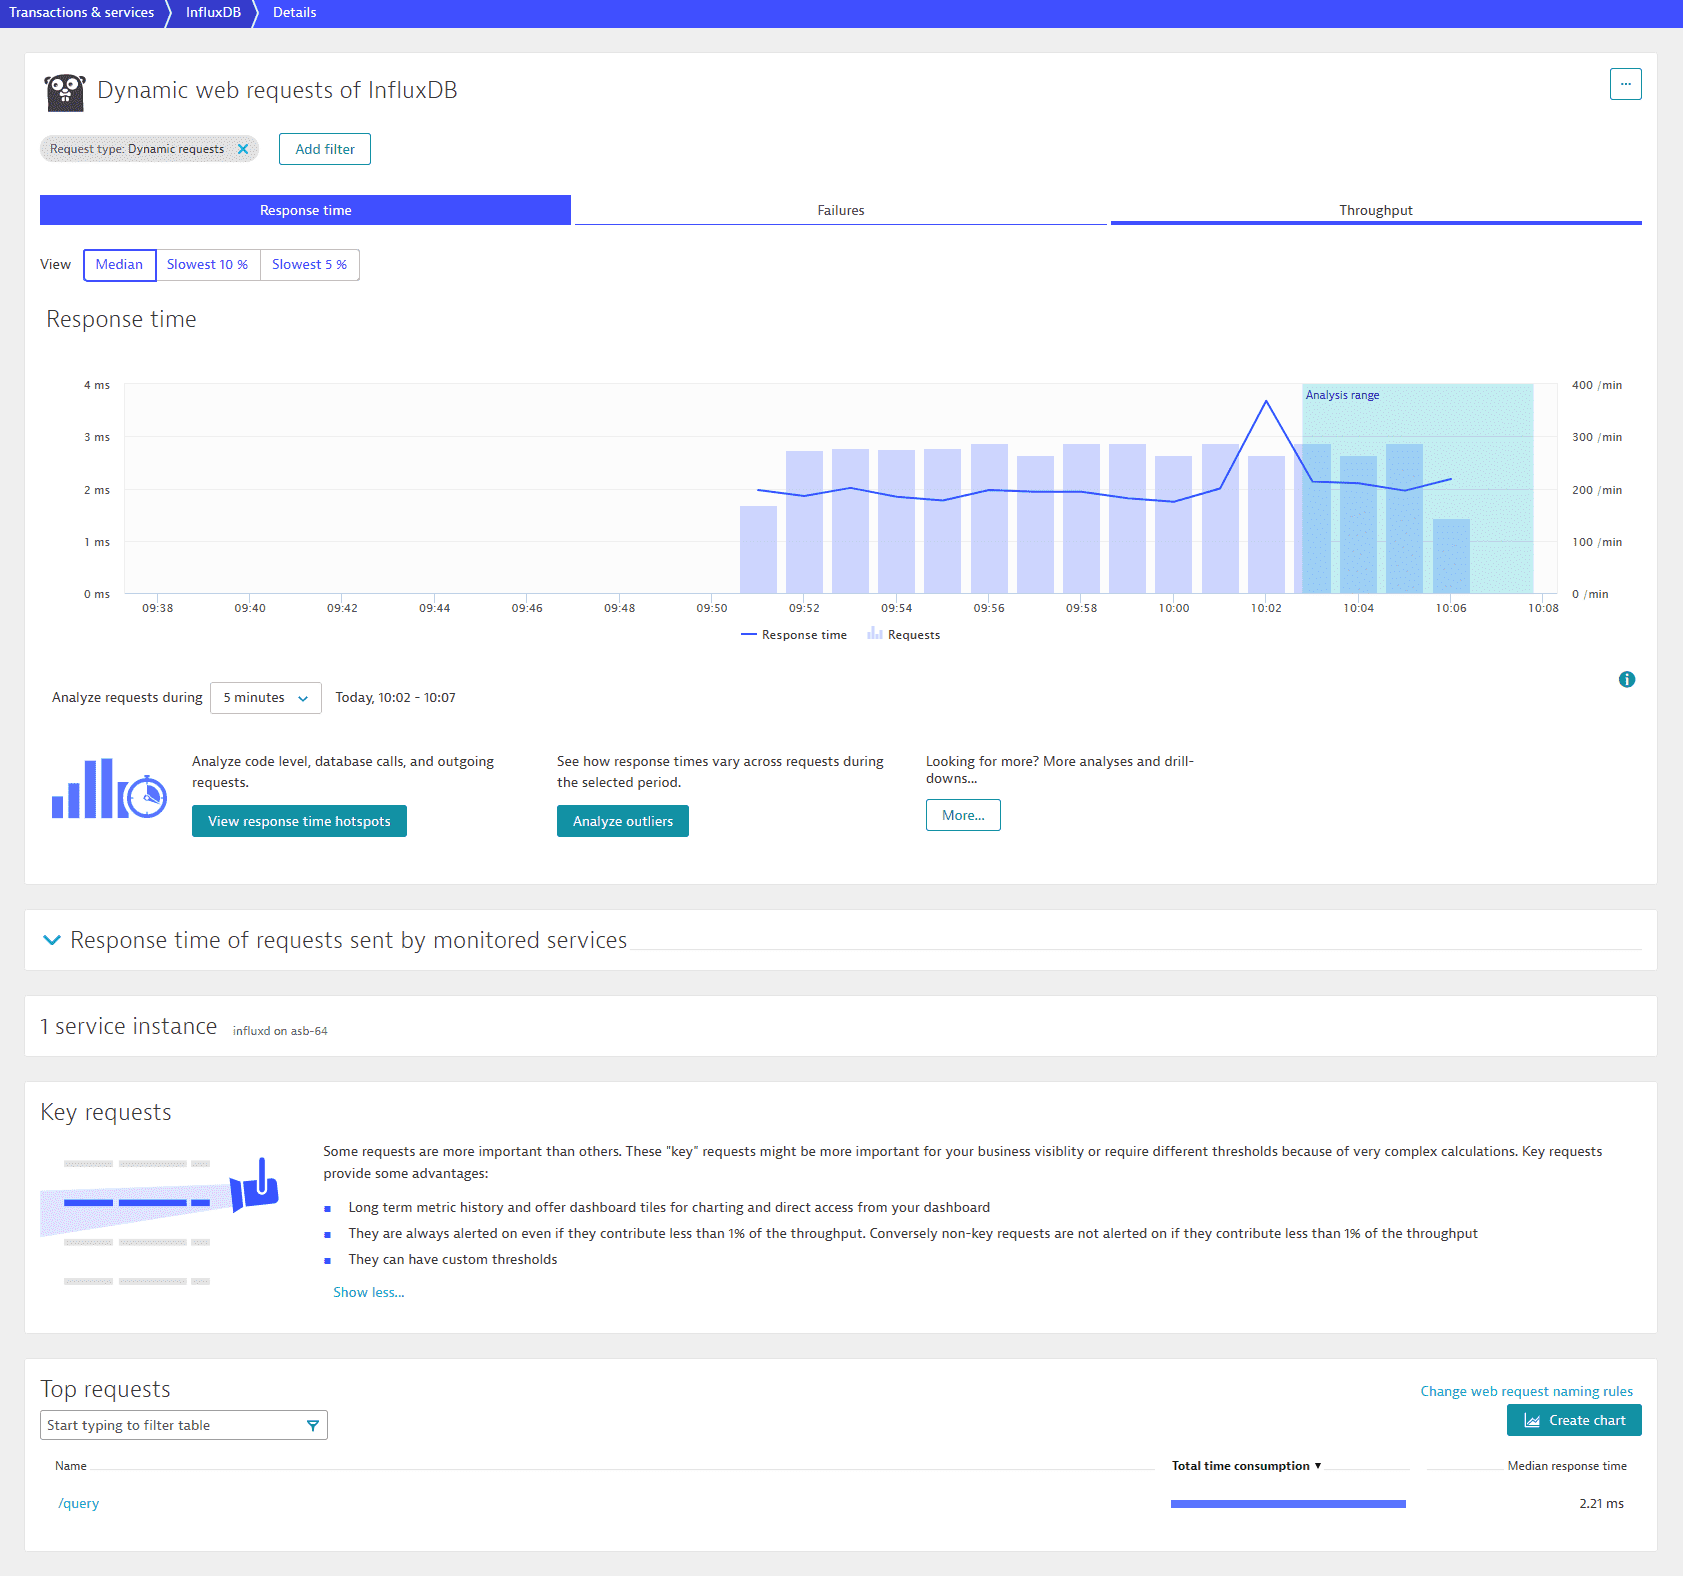 Dynamic web requests